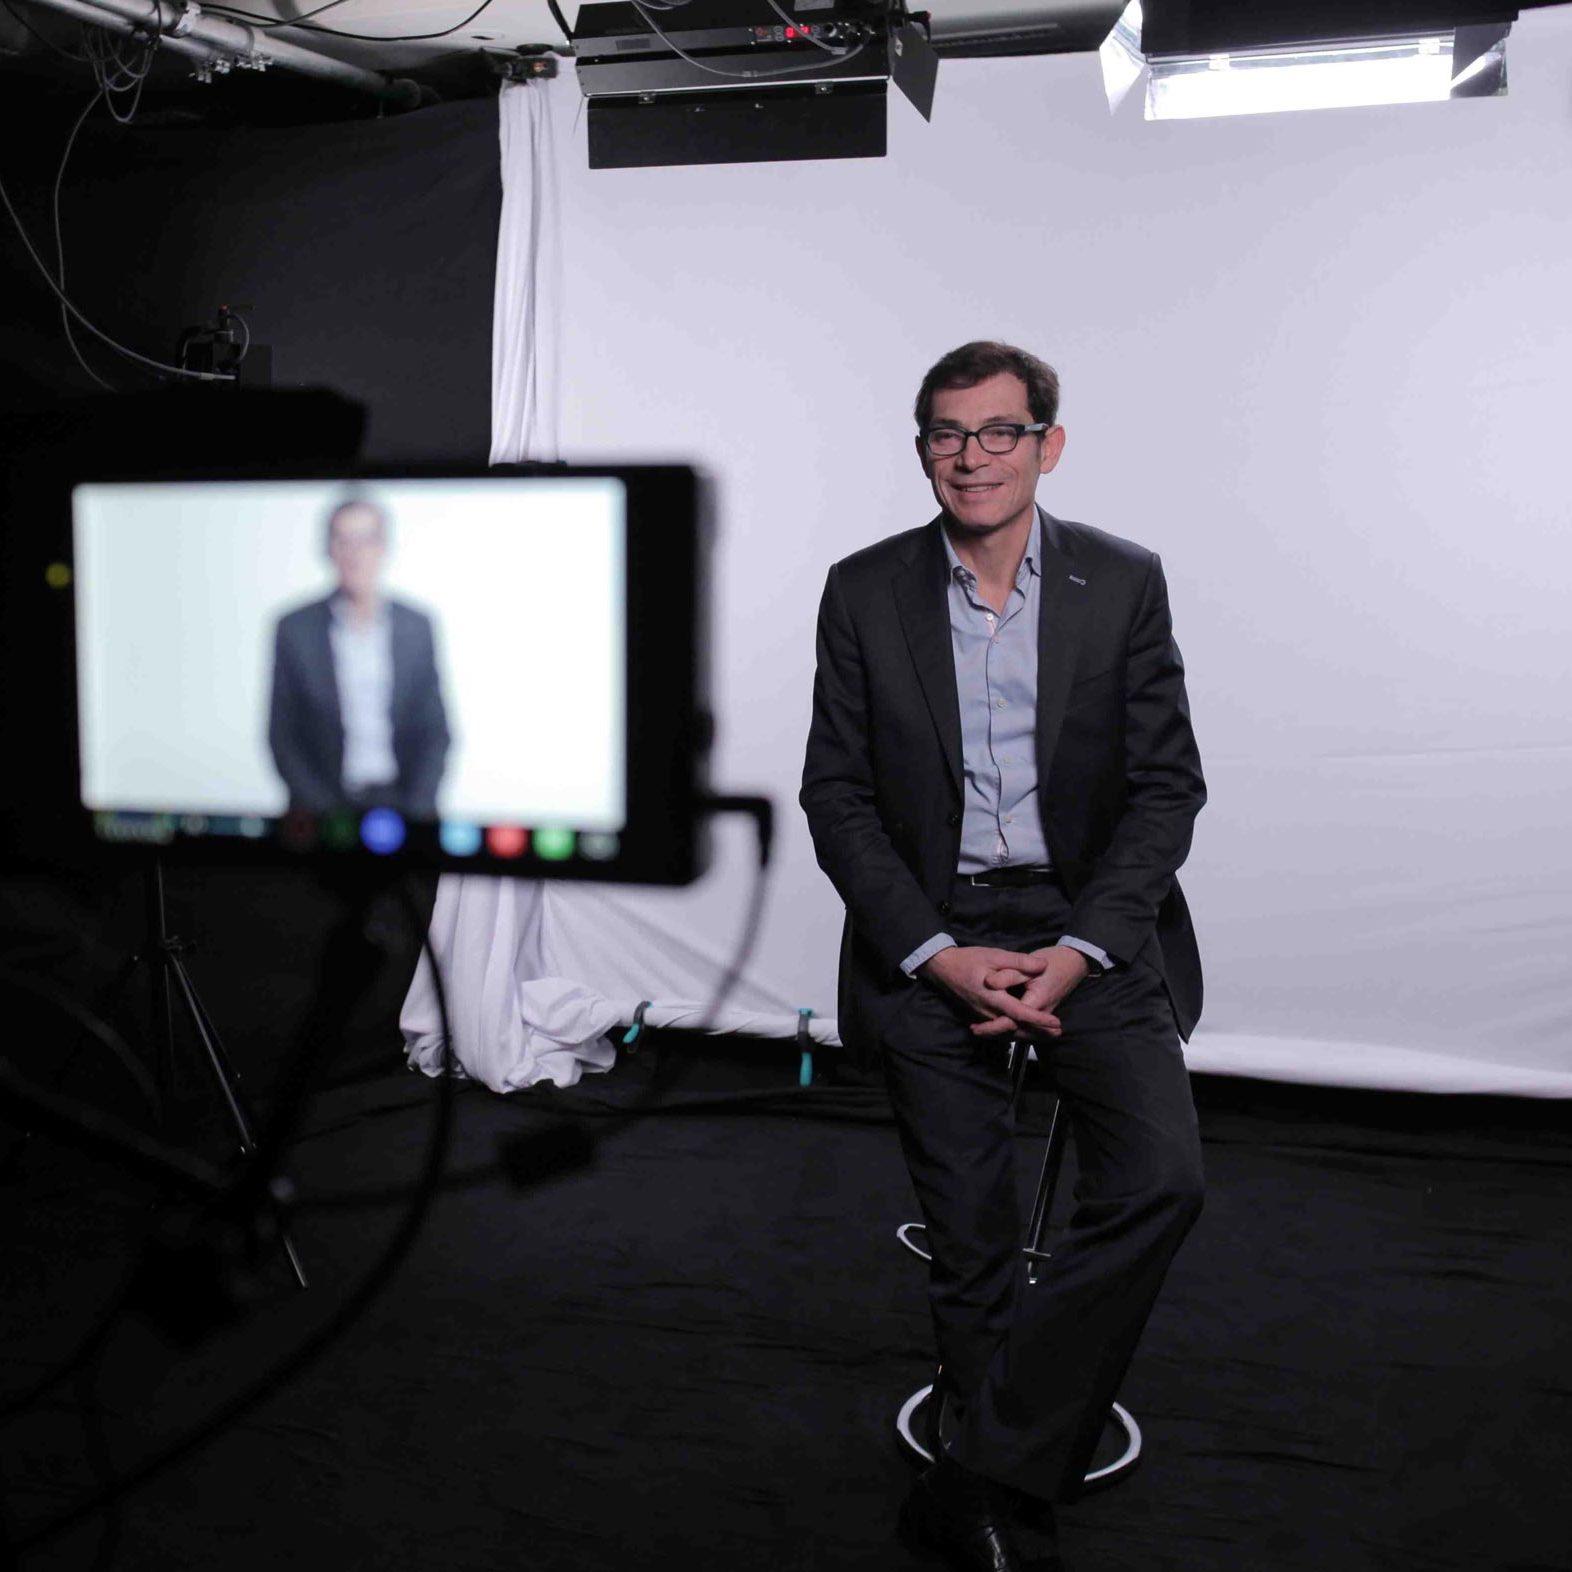 Fond blanc - Studio de tournage à Paris - Videology Studio